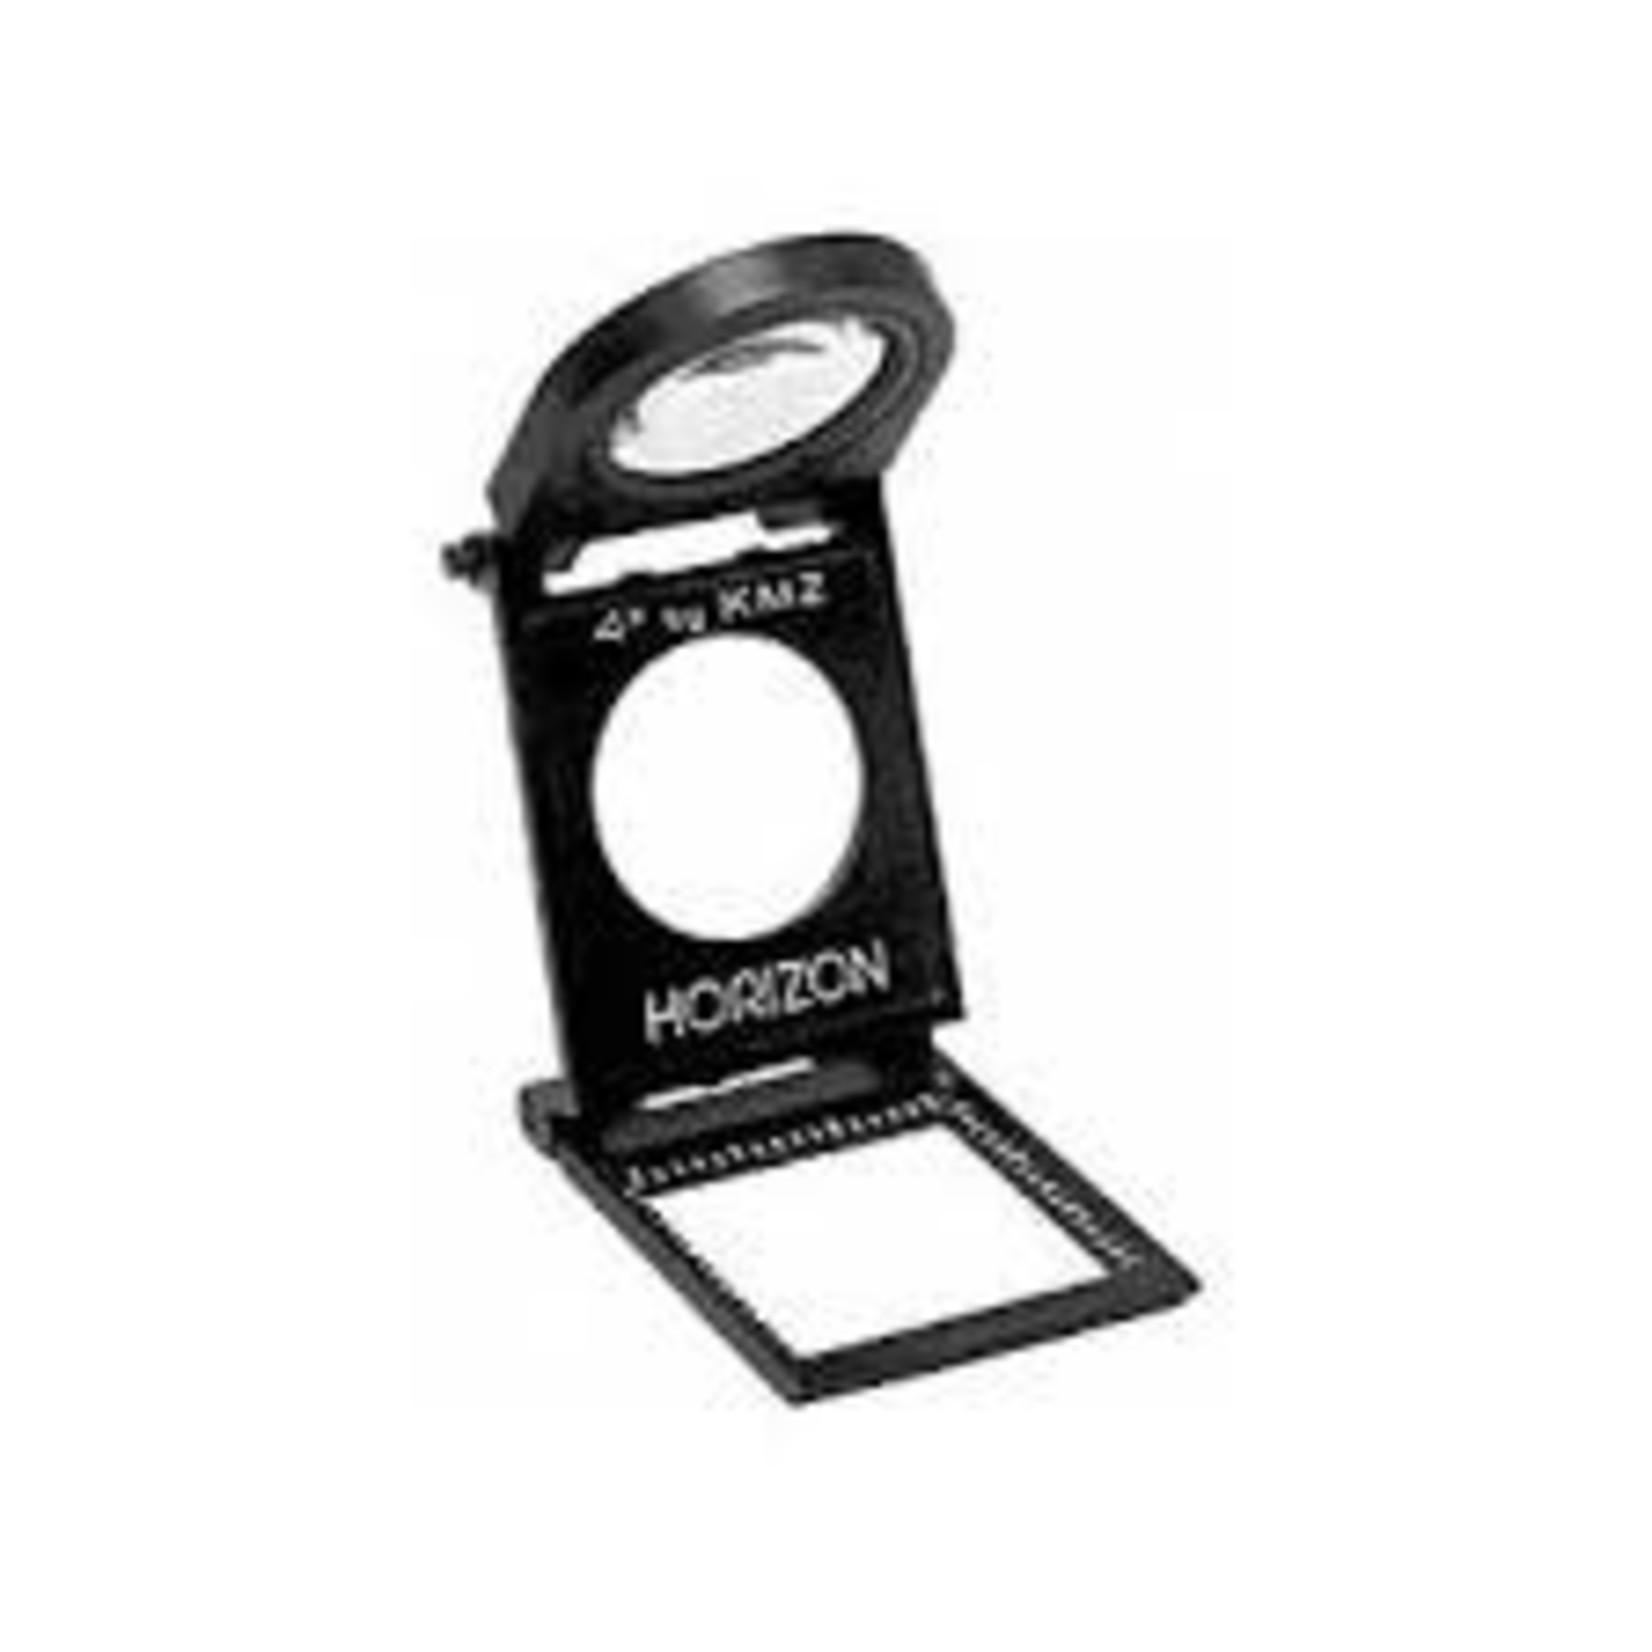 Argraph Corp. Horizon 4x Linen Tester